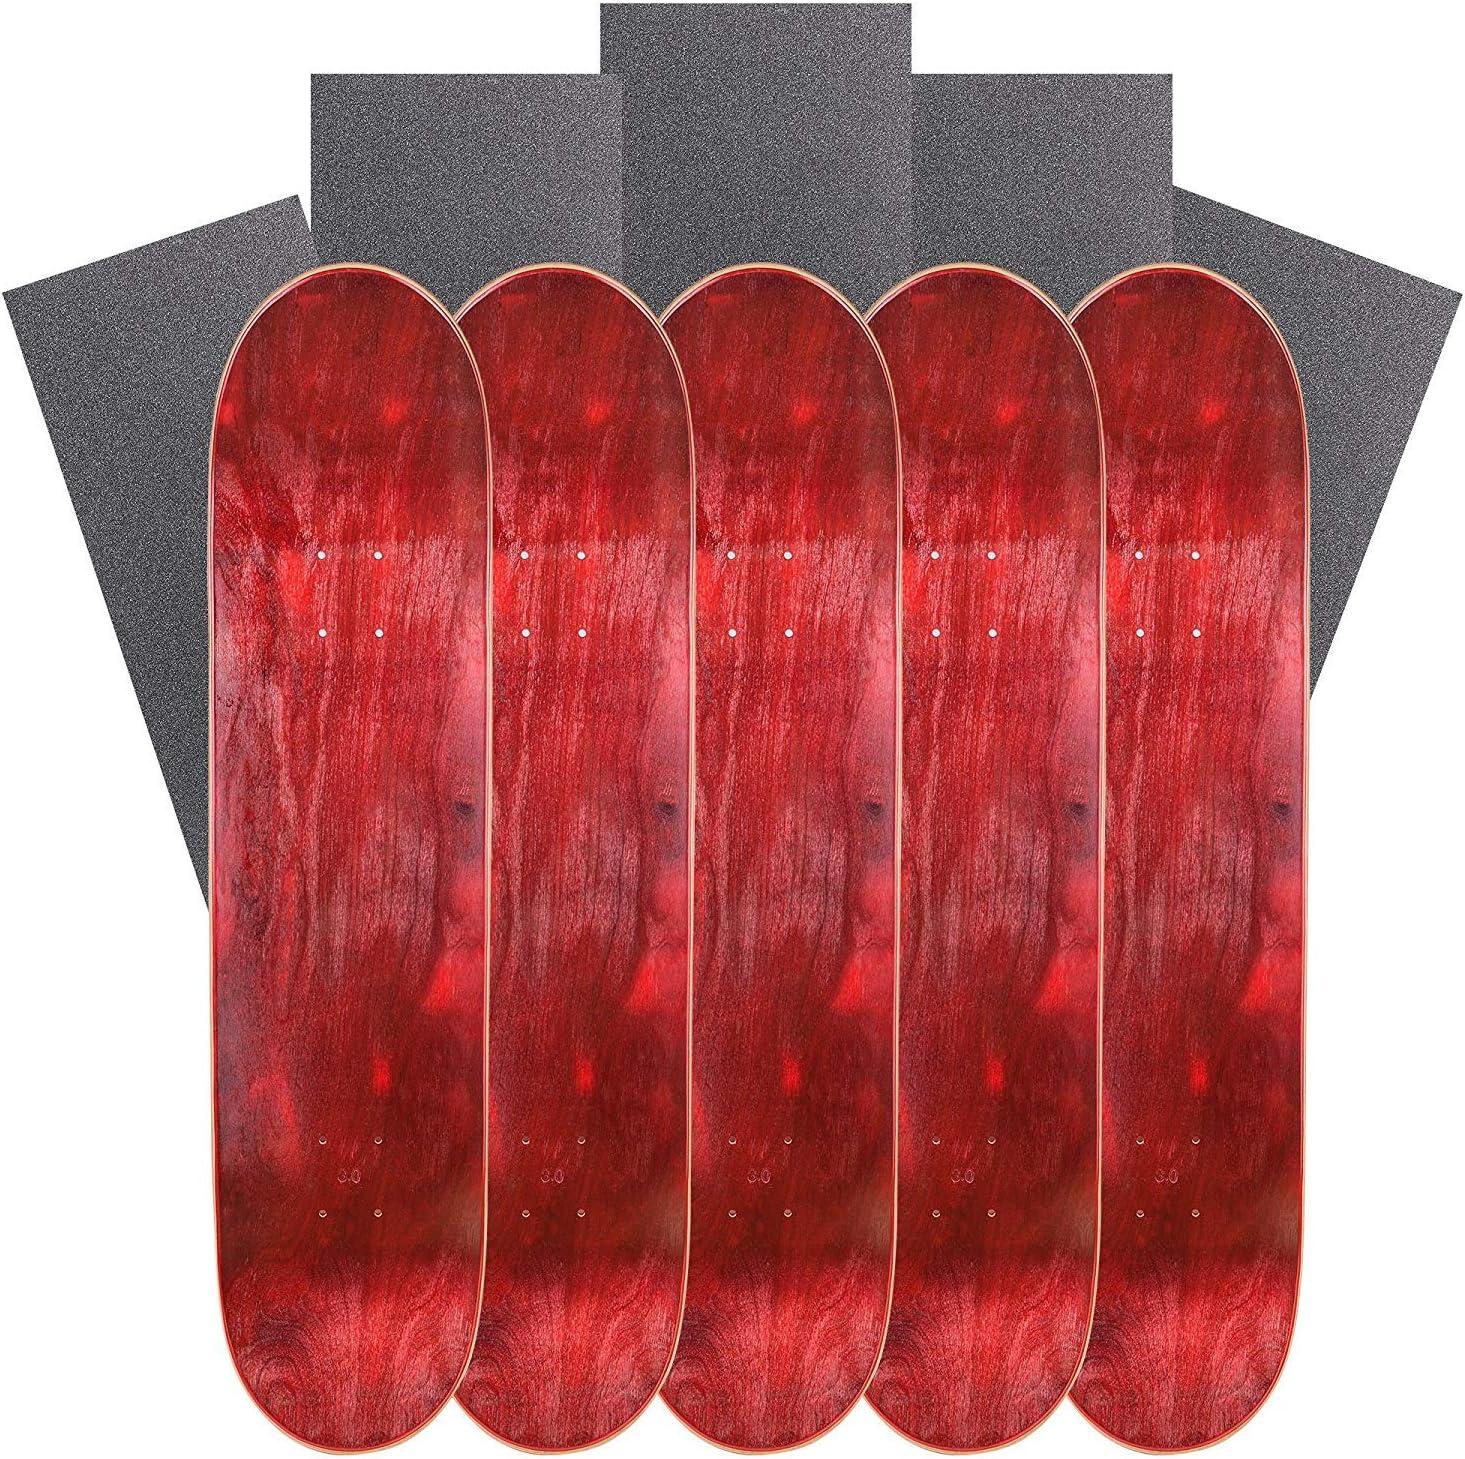 Set of 5 Cal 7 Blank Skateboard Decks with Grip